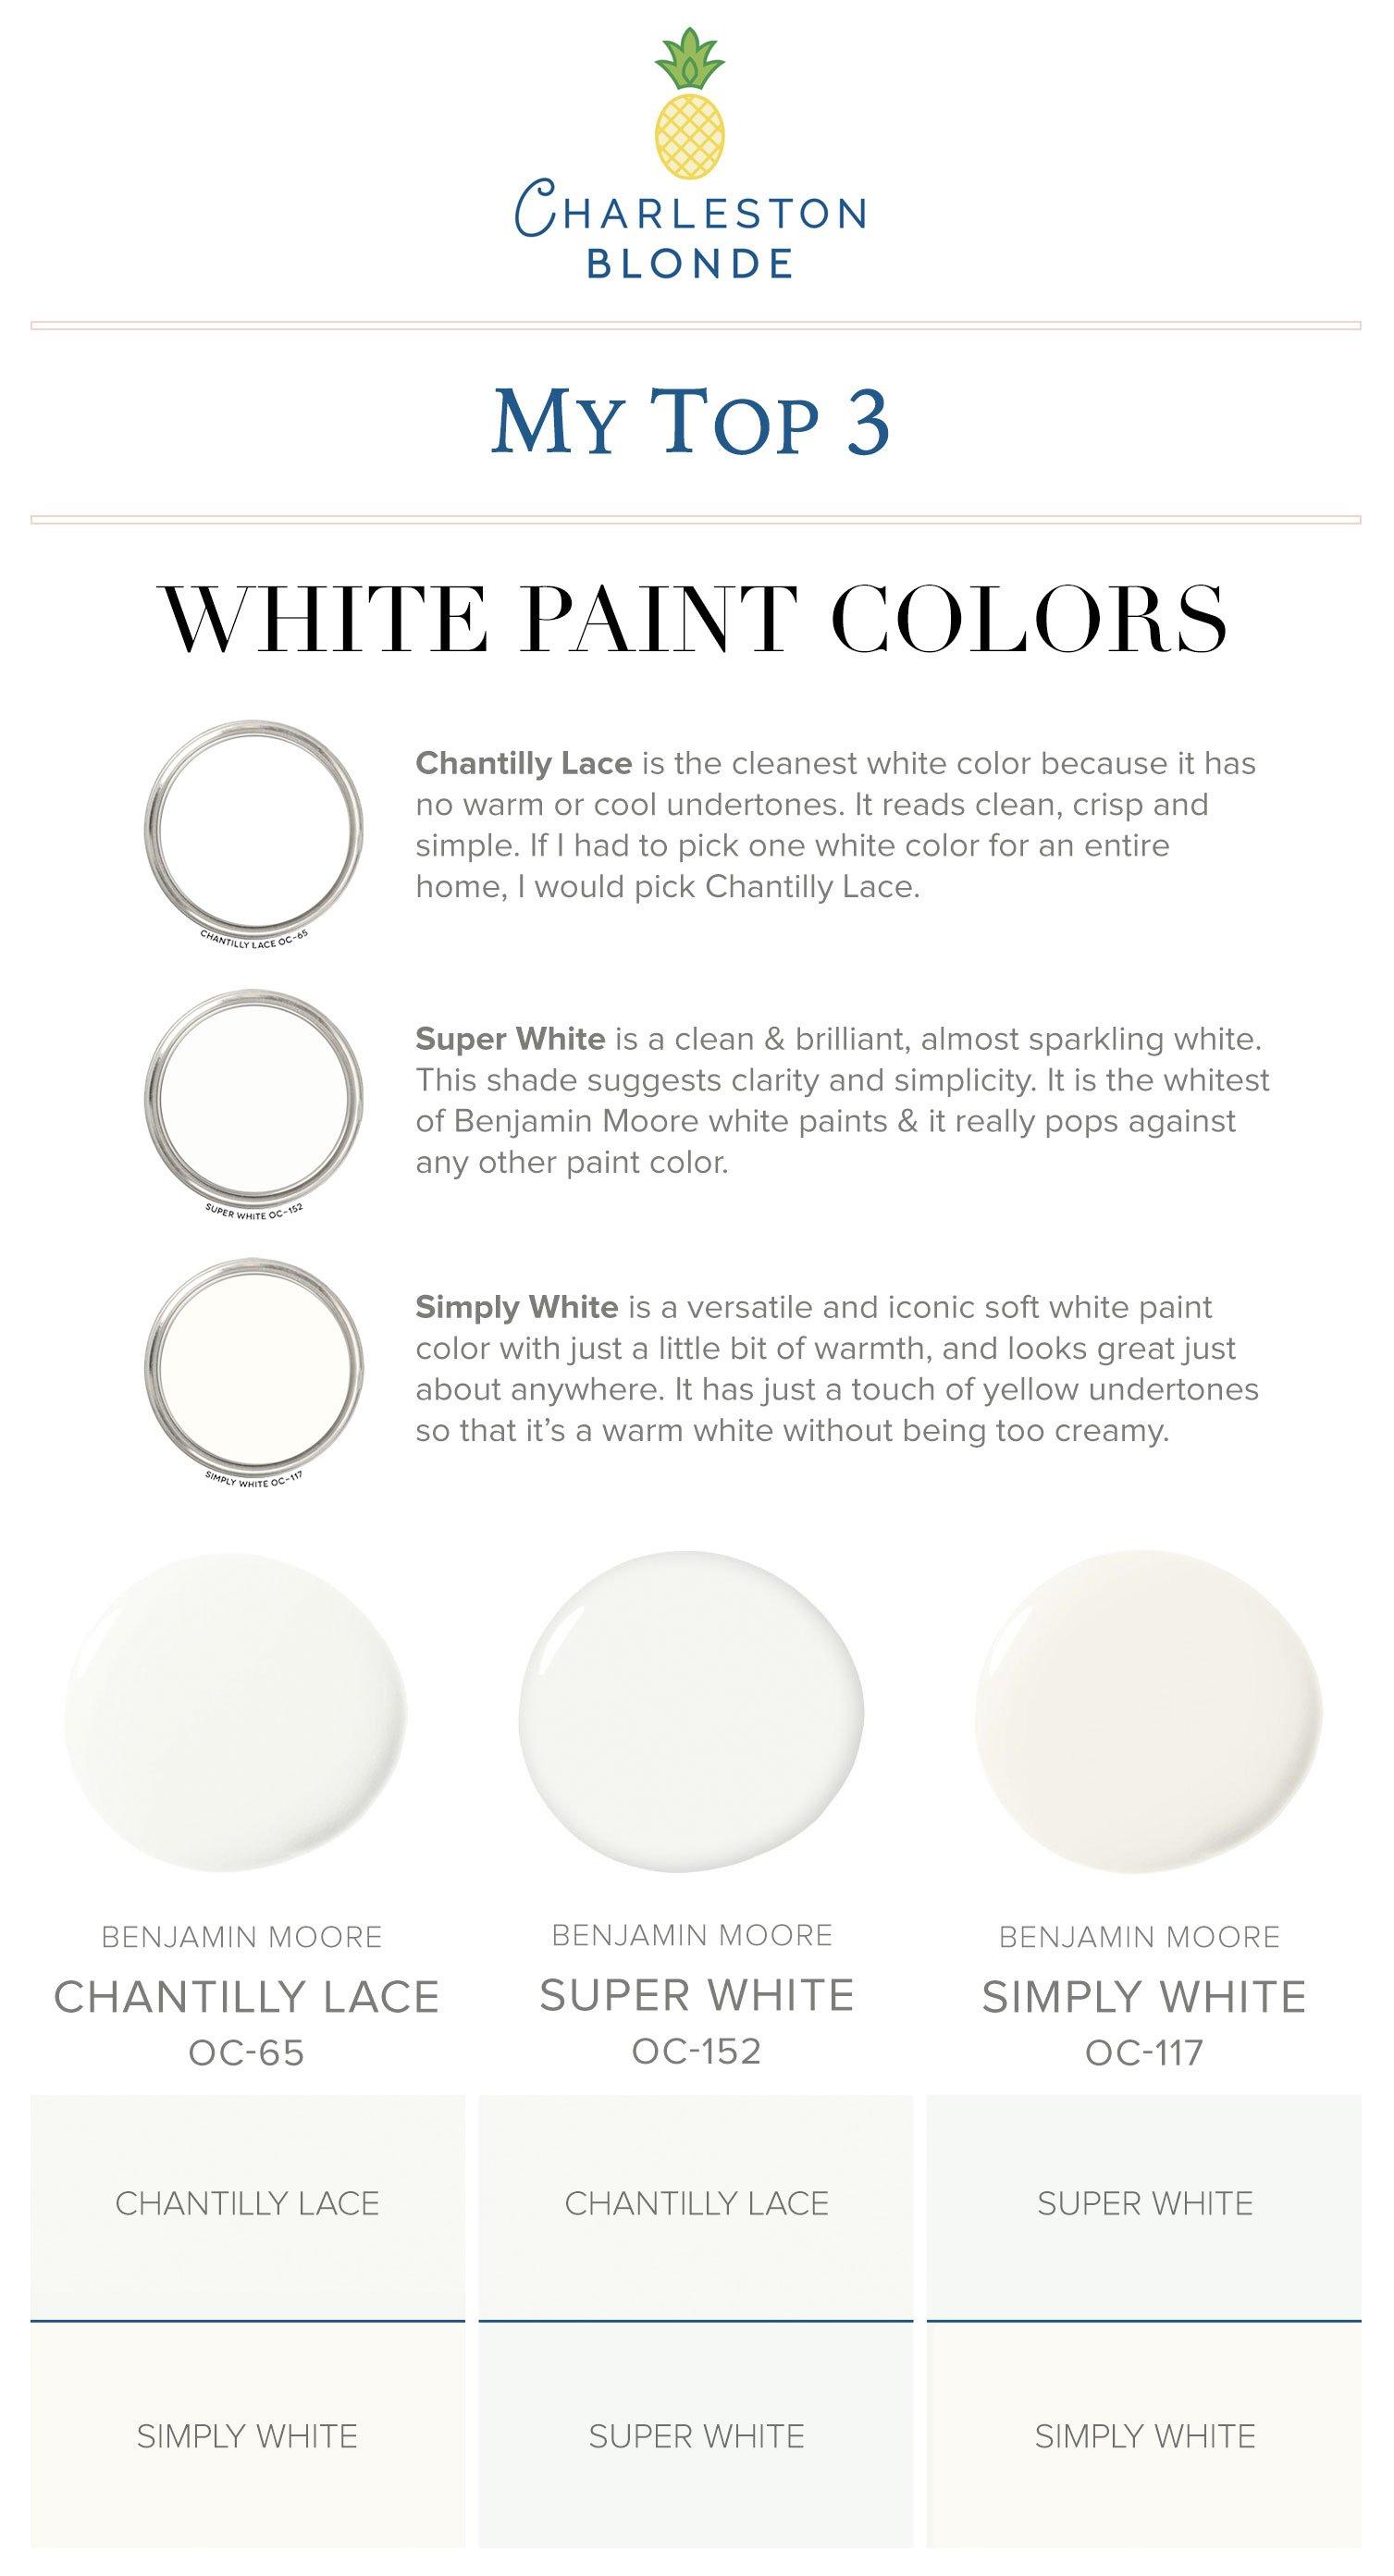 Favorite White Interior Paint Colors Charleston Blonde